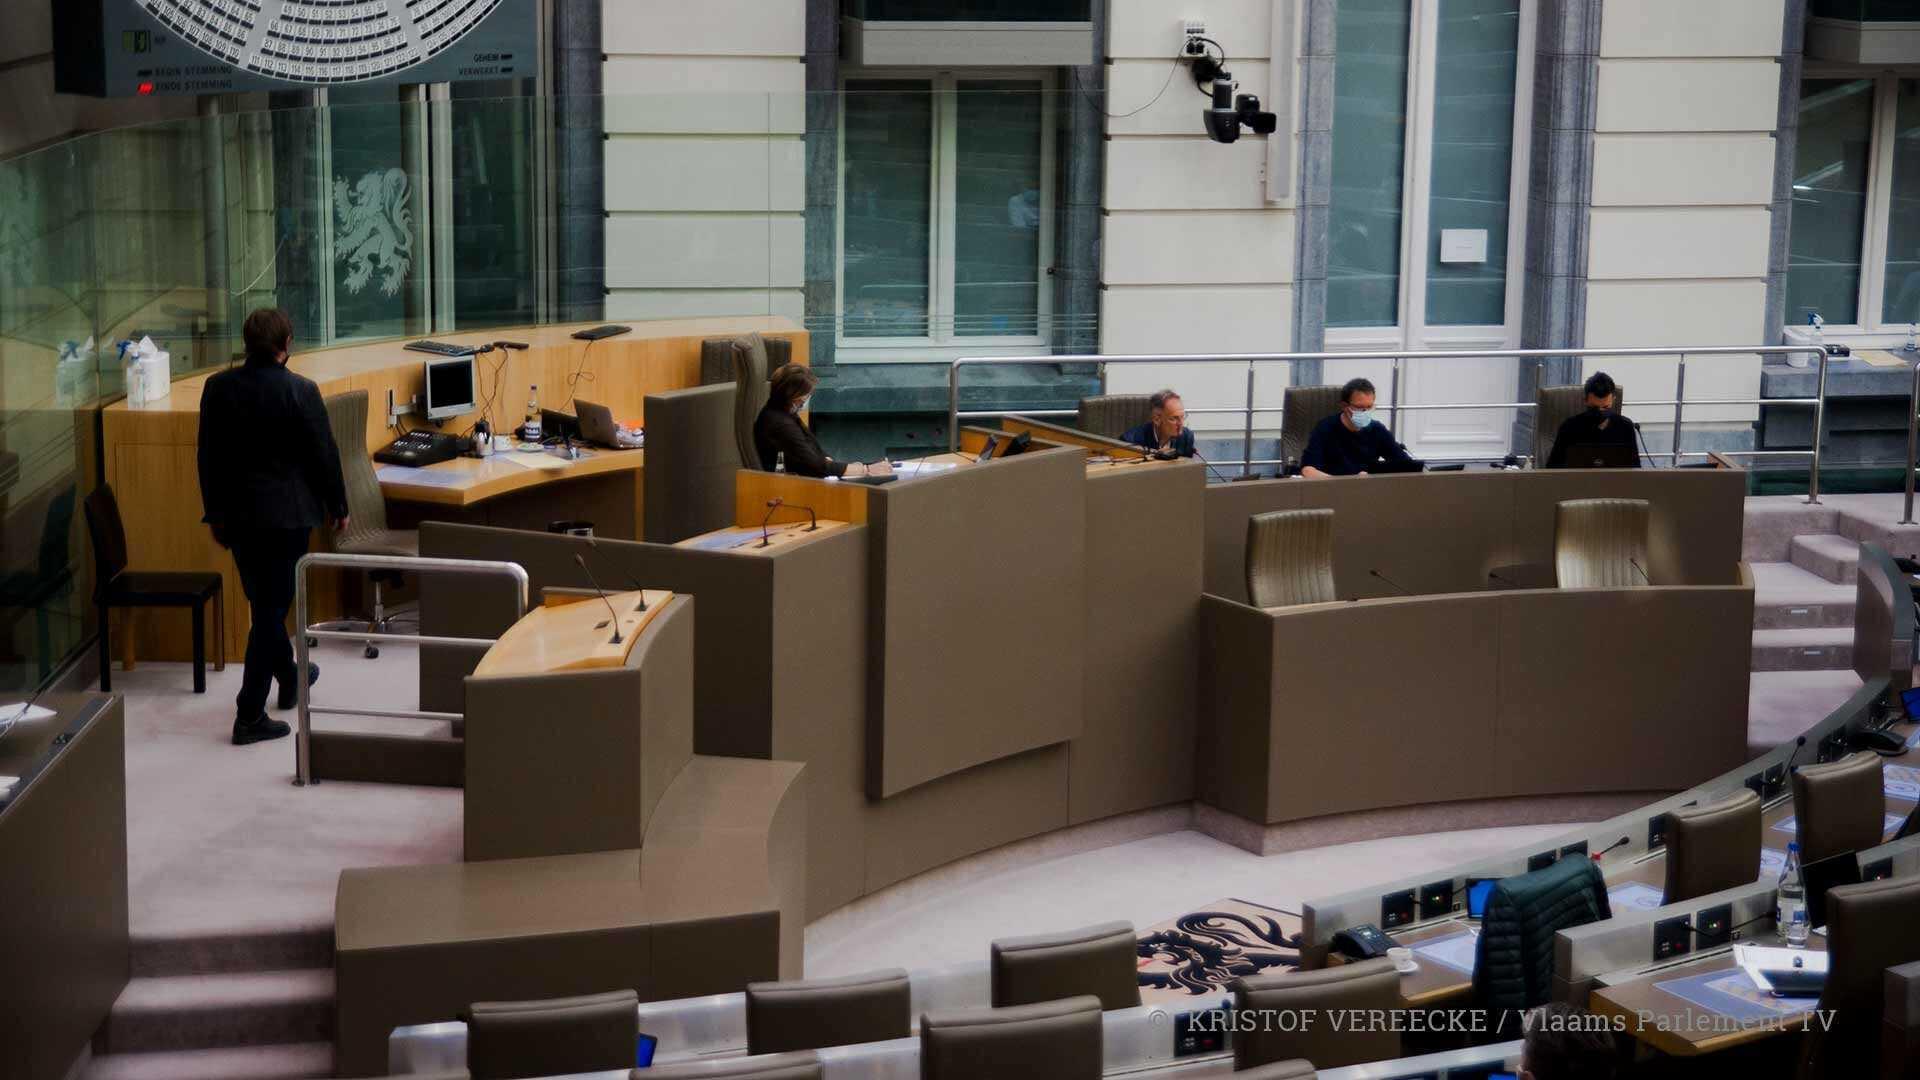 Nieuwe staatshervorming: hoorzitting over het arbeidsmarktbeleid